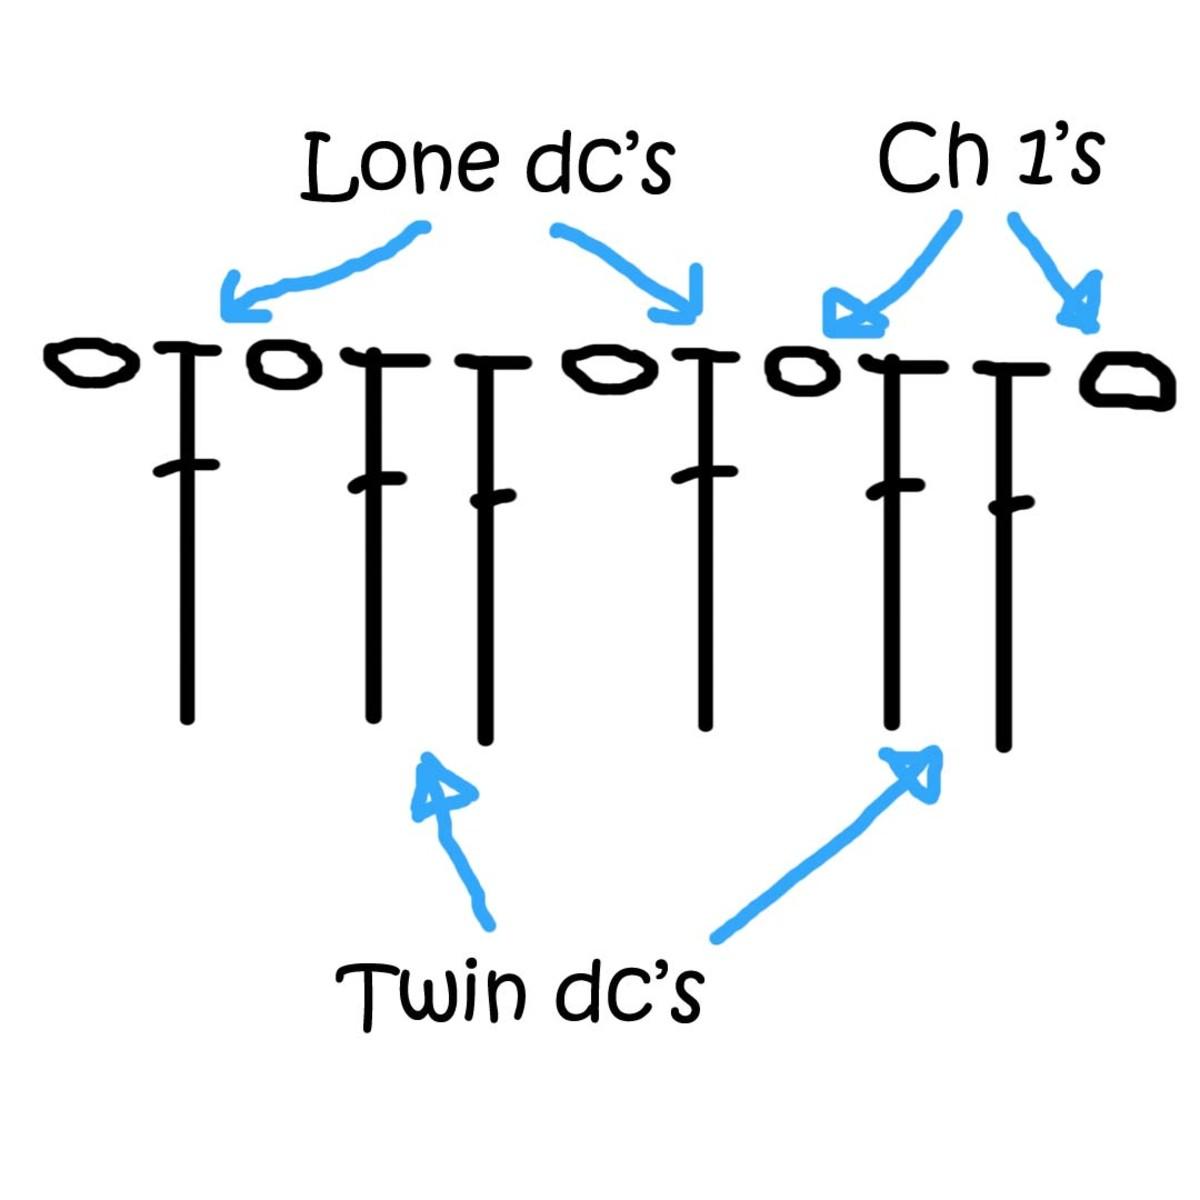 Figure 2: The stitches in the odd rows of the crocodile stitch pattern.